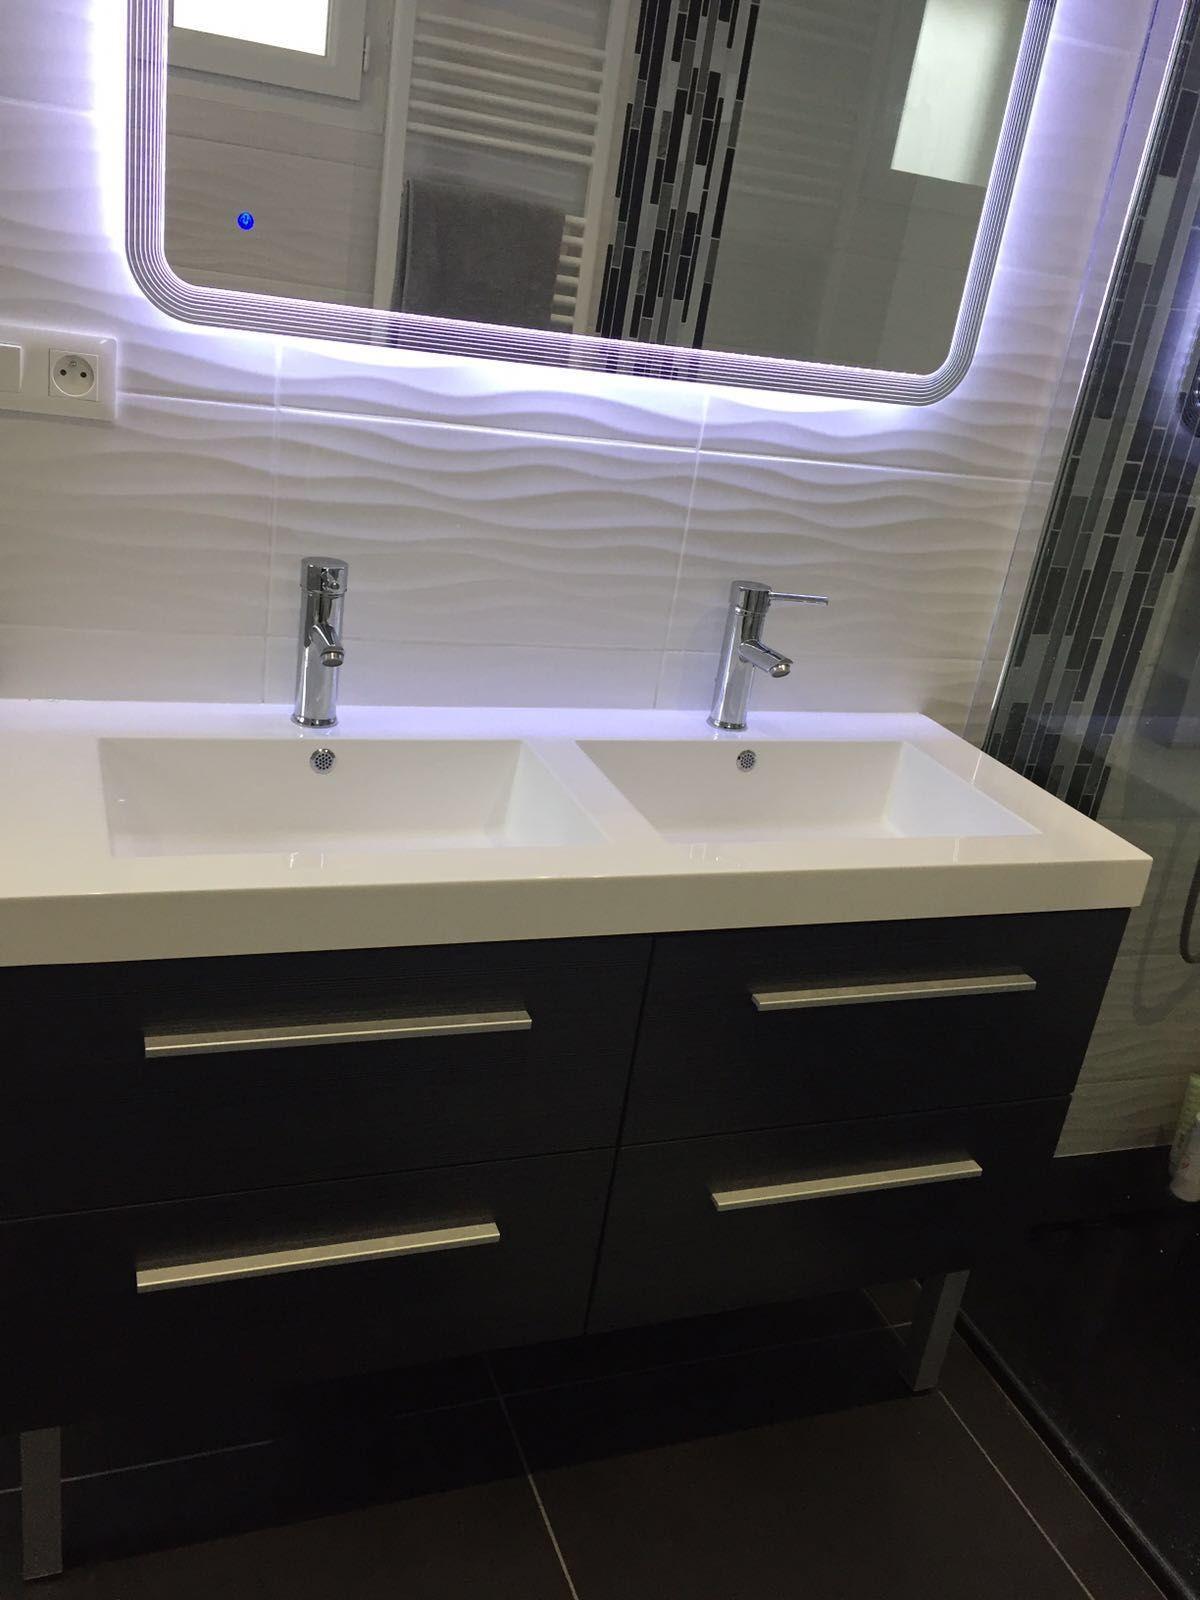 Salle de bain luxdecobat salle de bain luxdecobat - Reglette infrarouge salle de bain ...